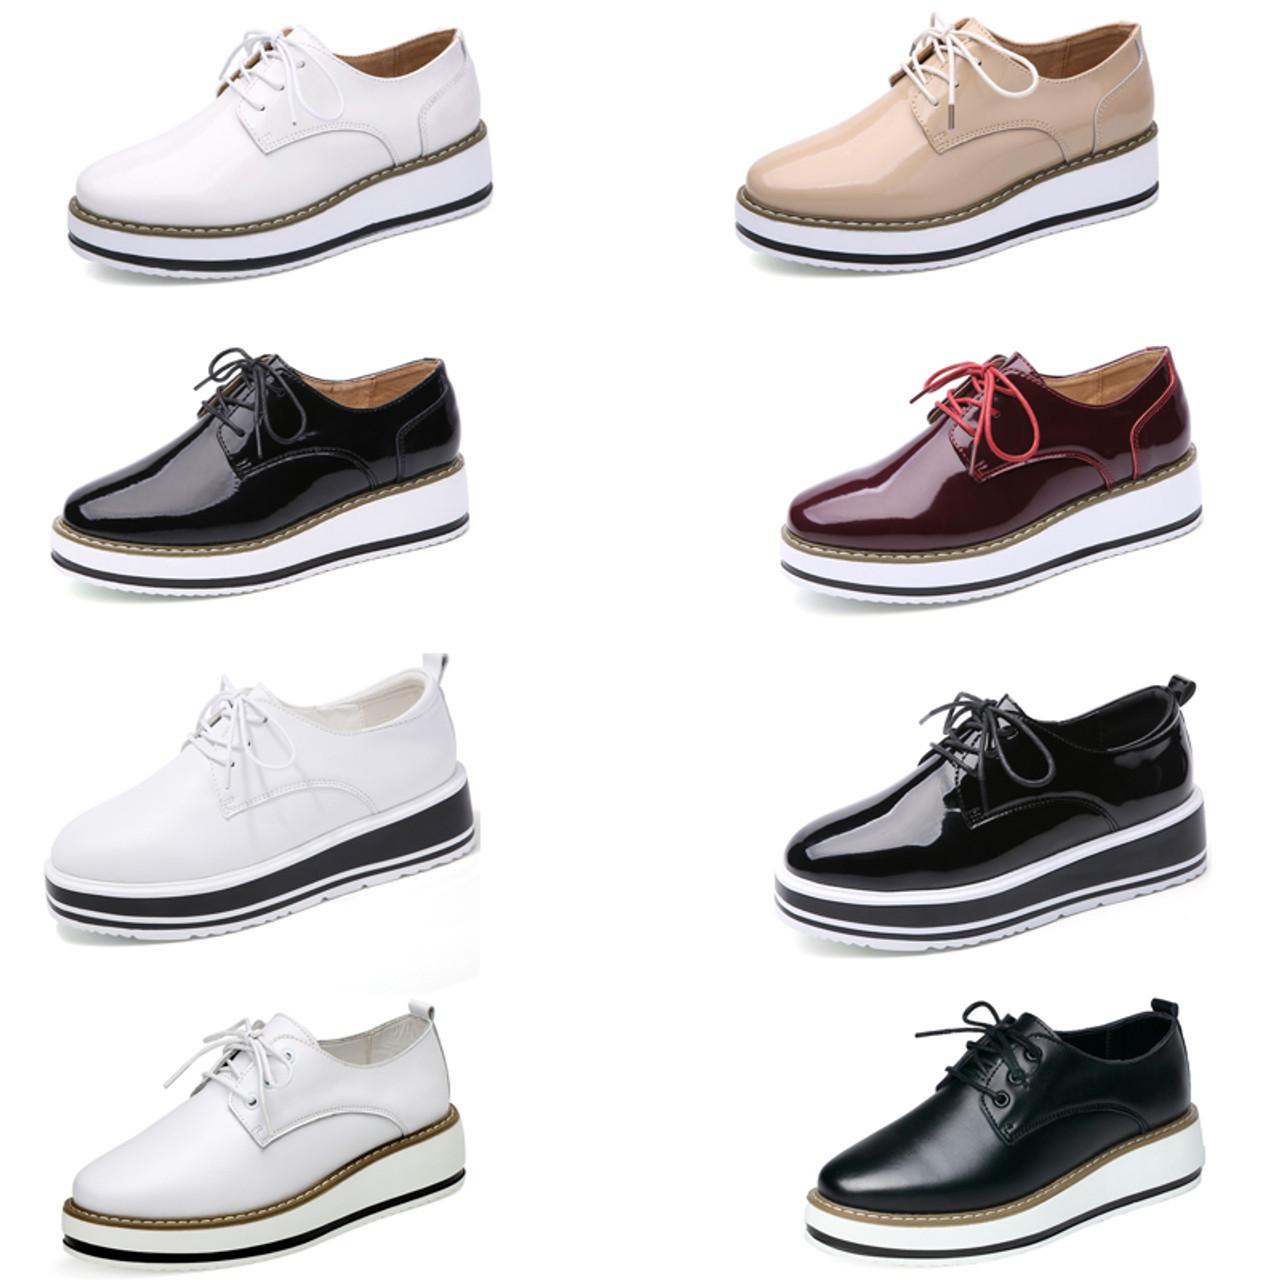 662fd3554f1 ... EOFK Brand Spring Women Platform Shoes Woman Brogue Patent Leather  Flats Lace Up Footwear Female Flat ...